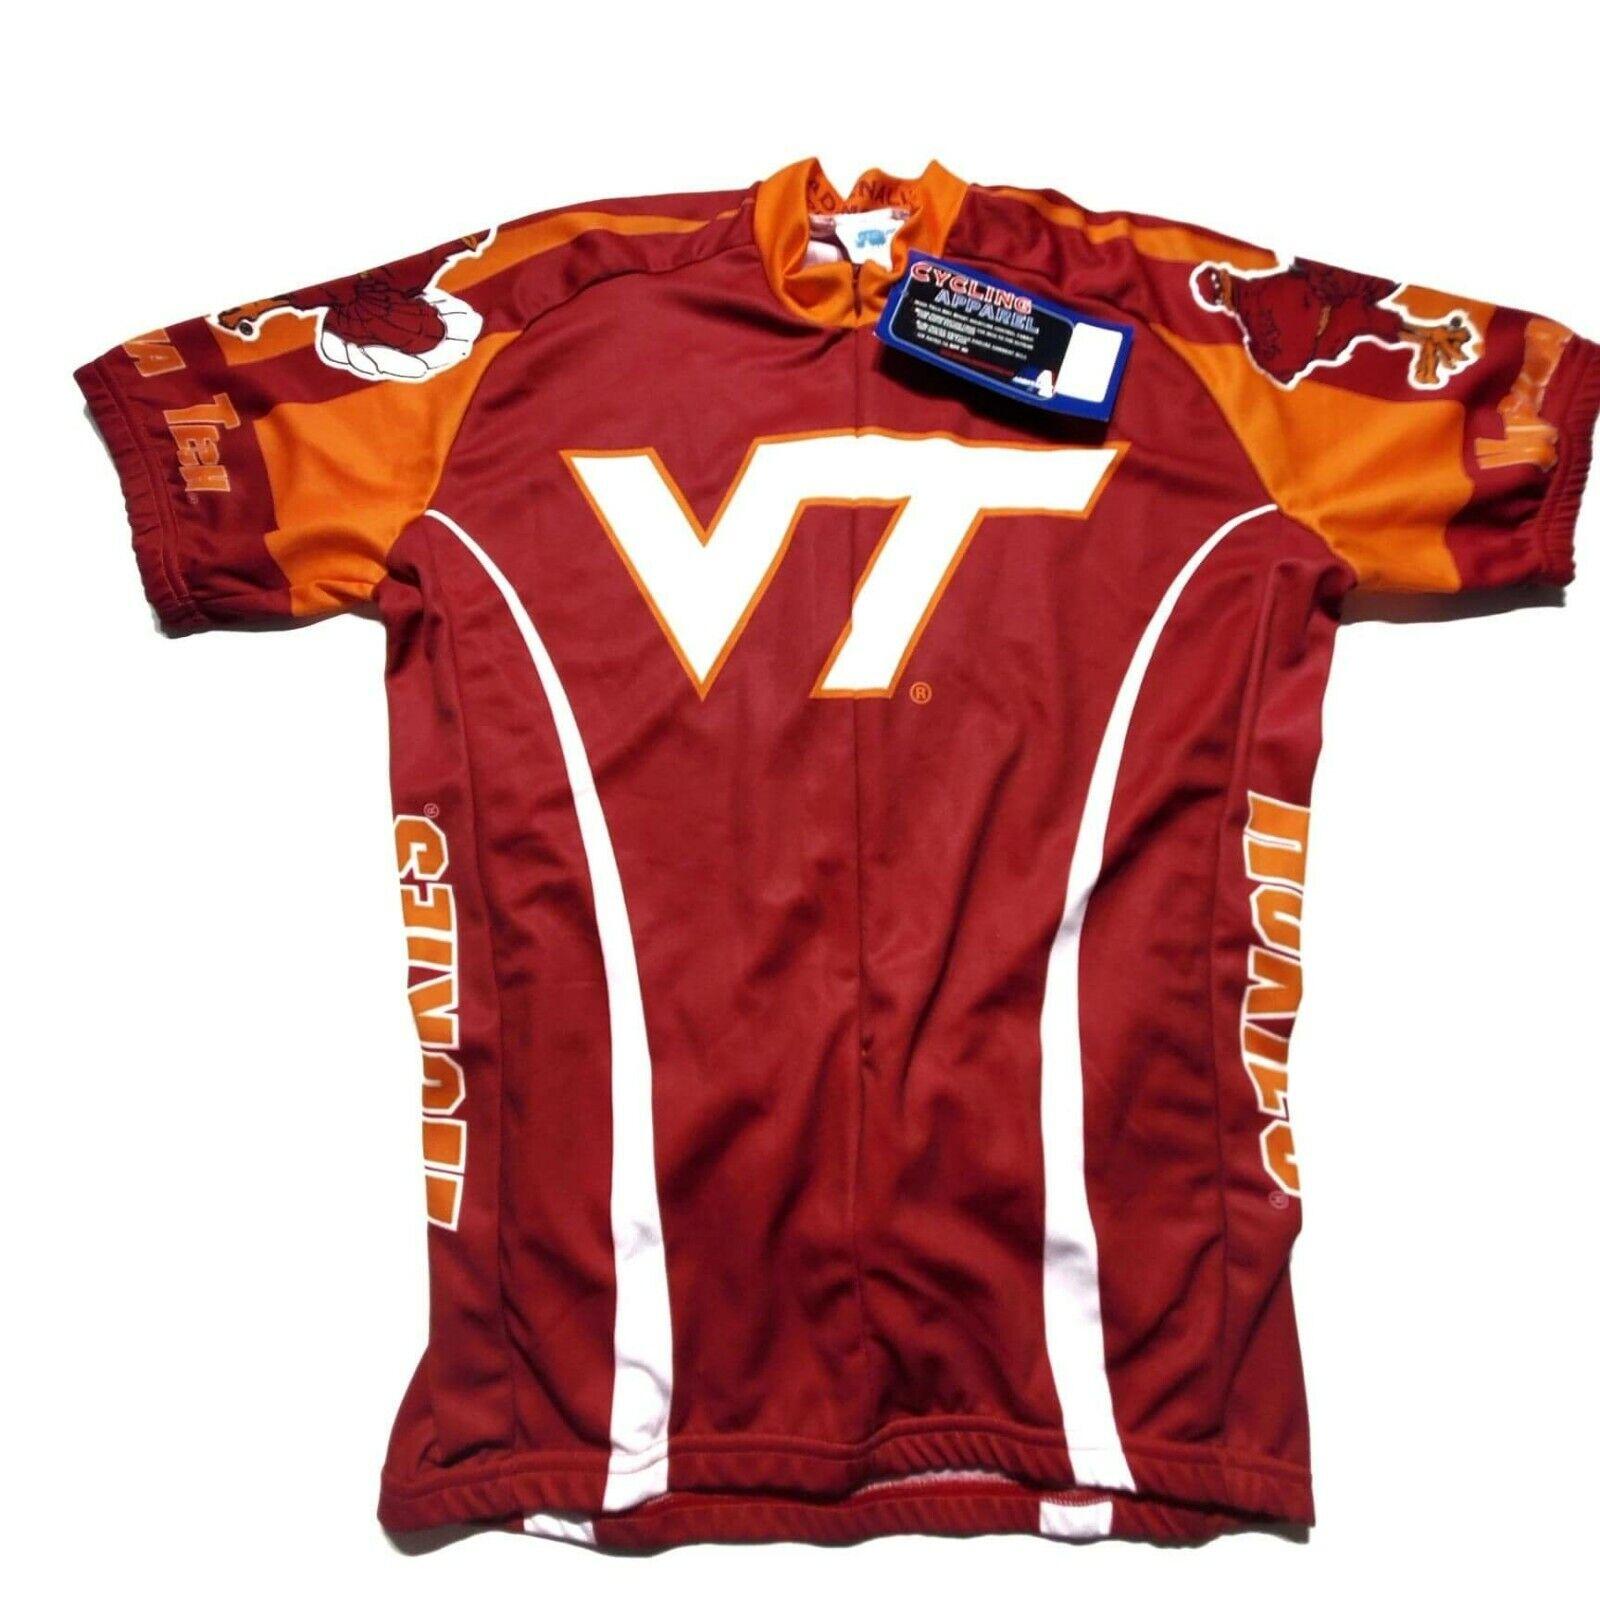 NCAA Men/'s Adrenaline Promotions West Virginia Mountaineers Cycling Jersey